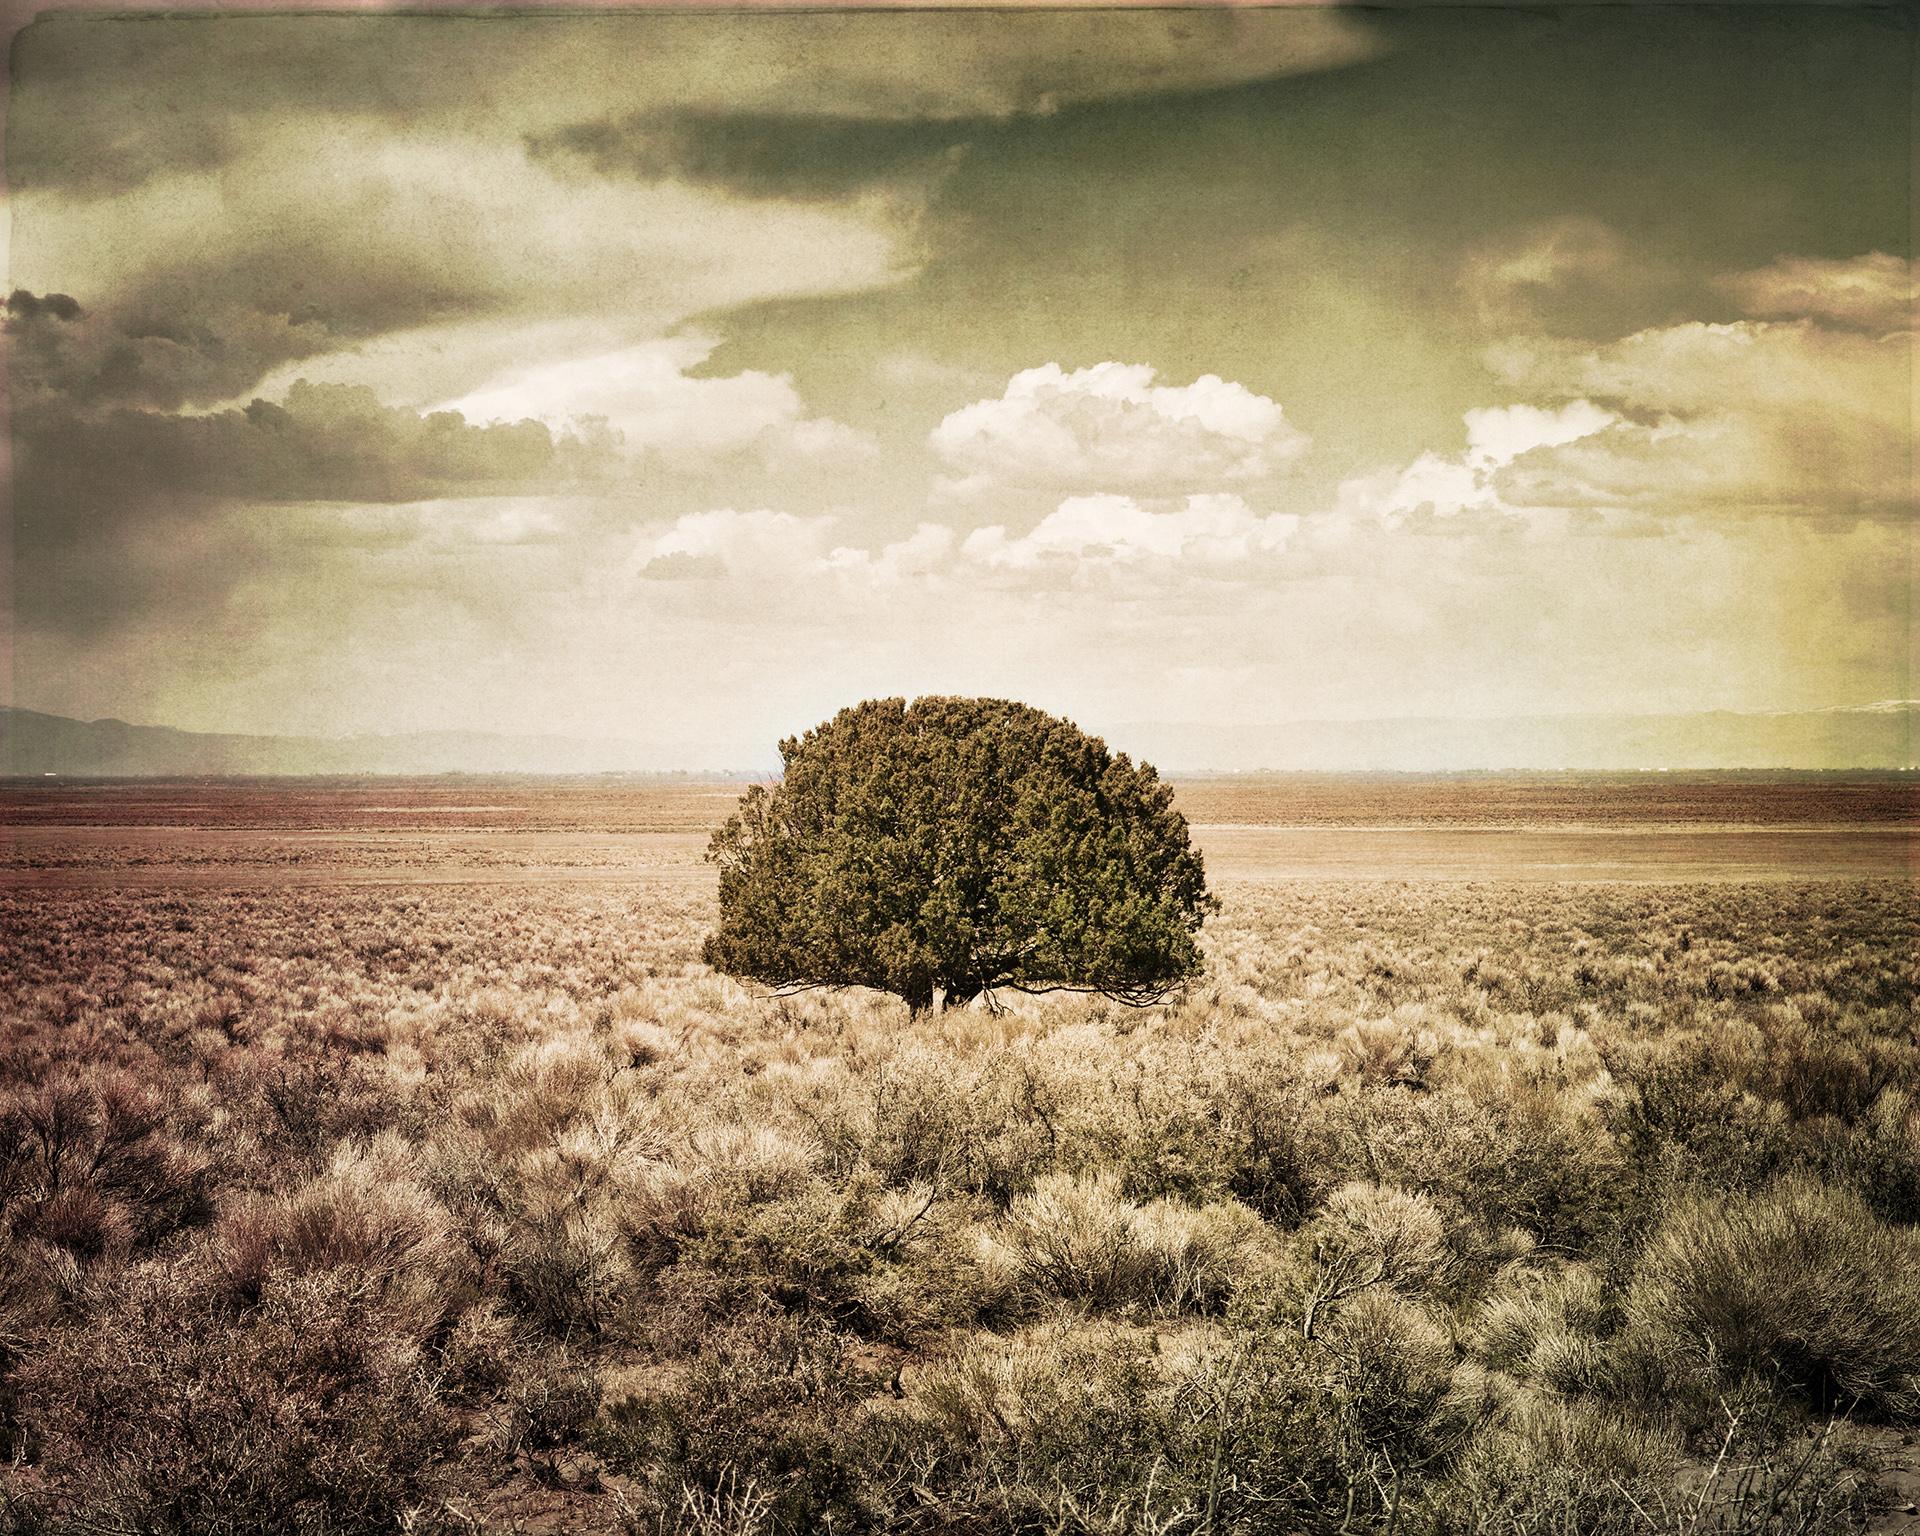 Jim_Sincock-Lone_Tree.jpg